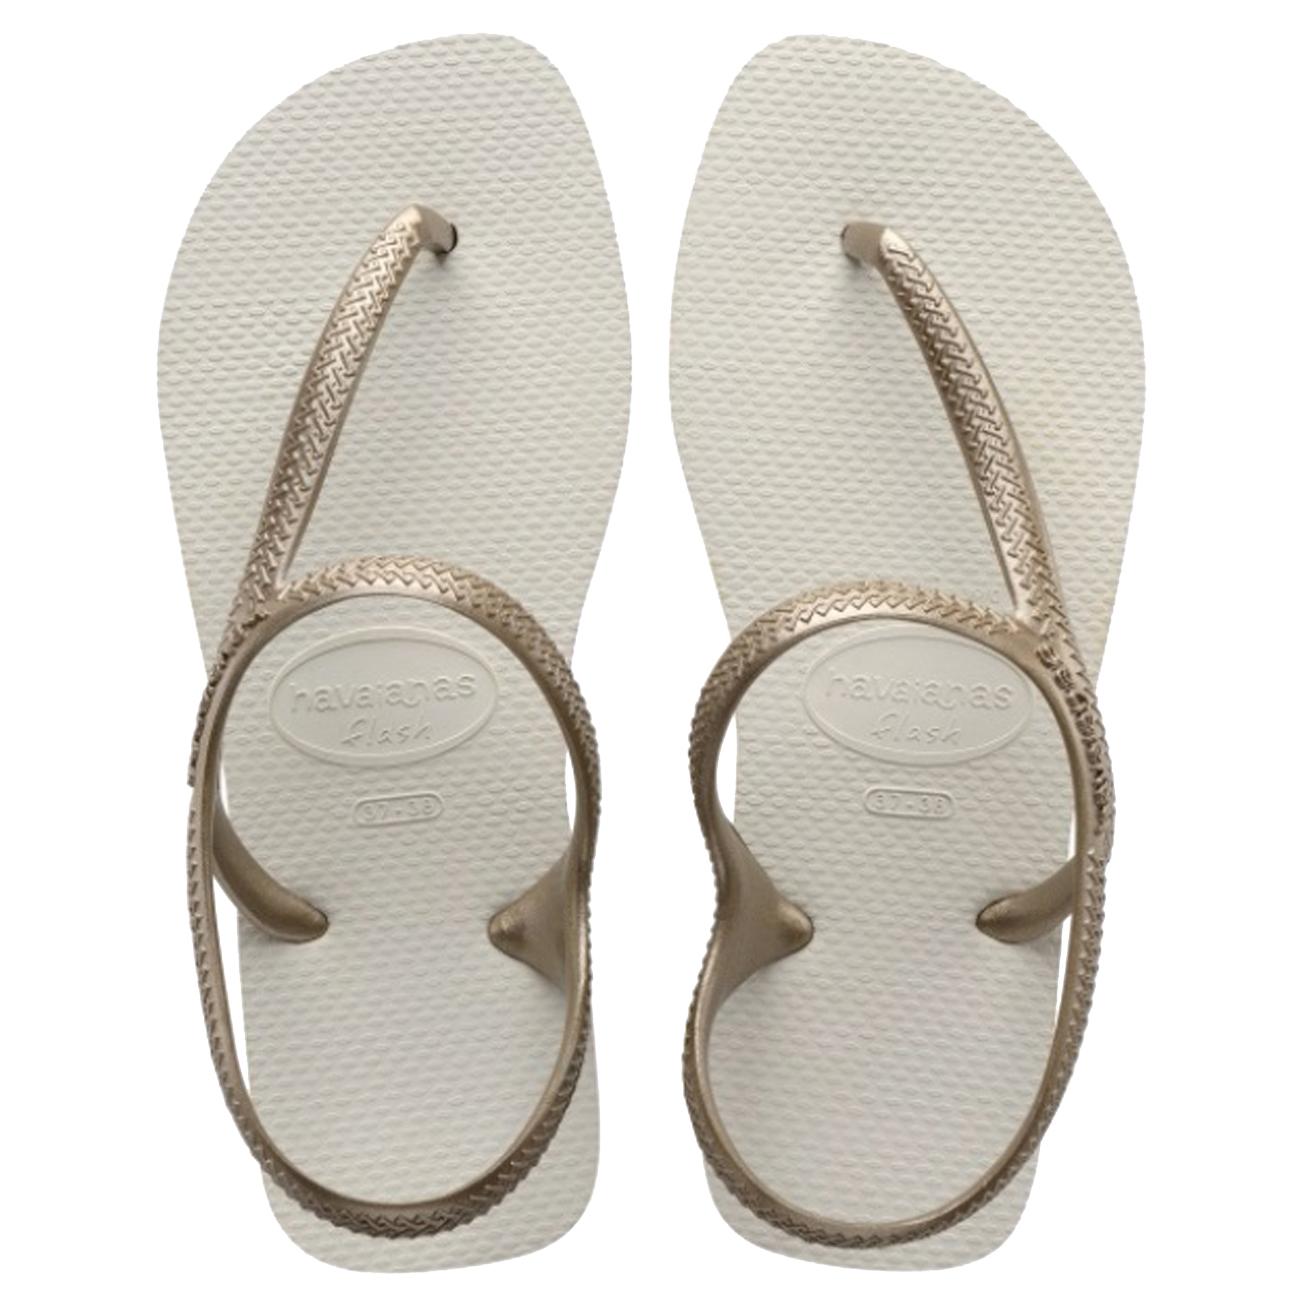 c90ba799b Womens Havaianas Flash Urban Strappy Lightweight Sandals Beach Flip Flops  UK 3-8